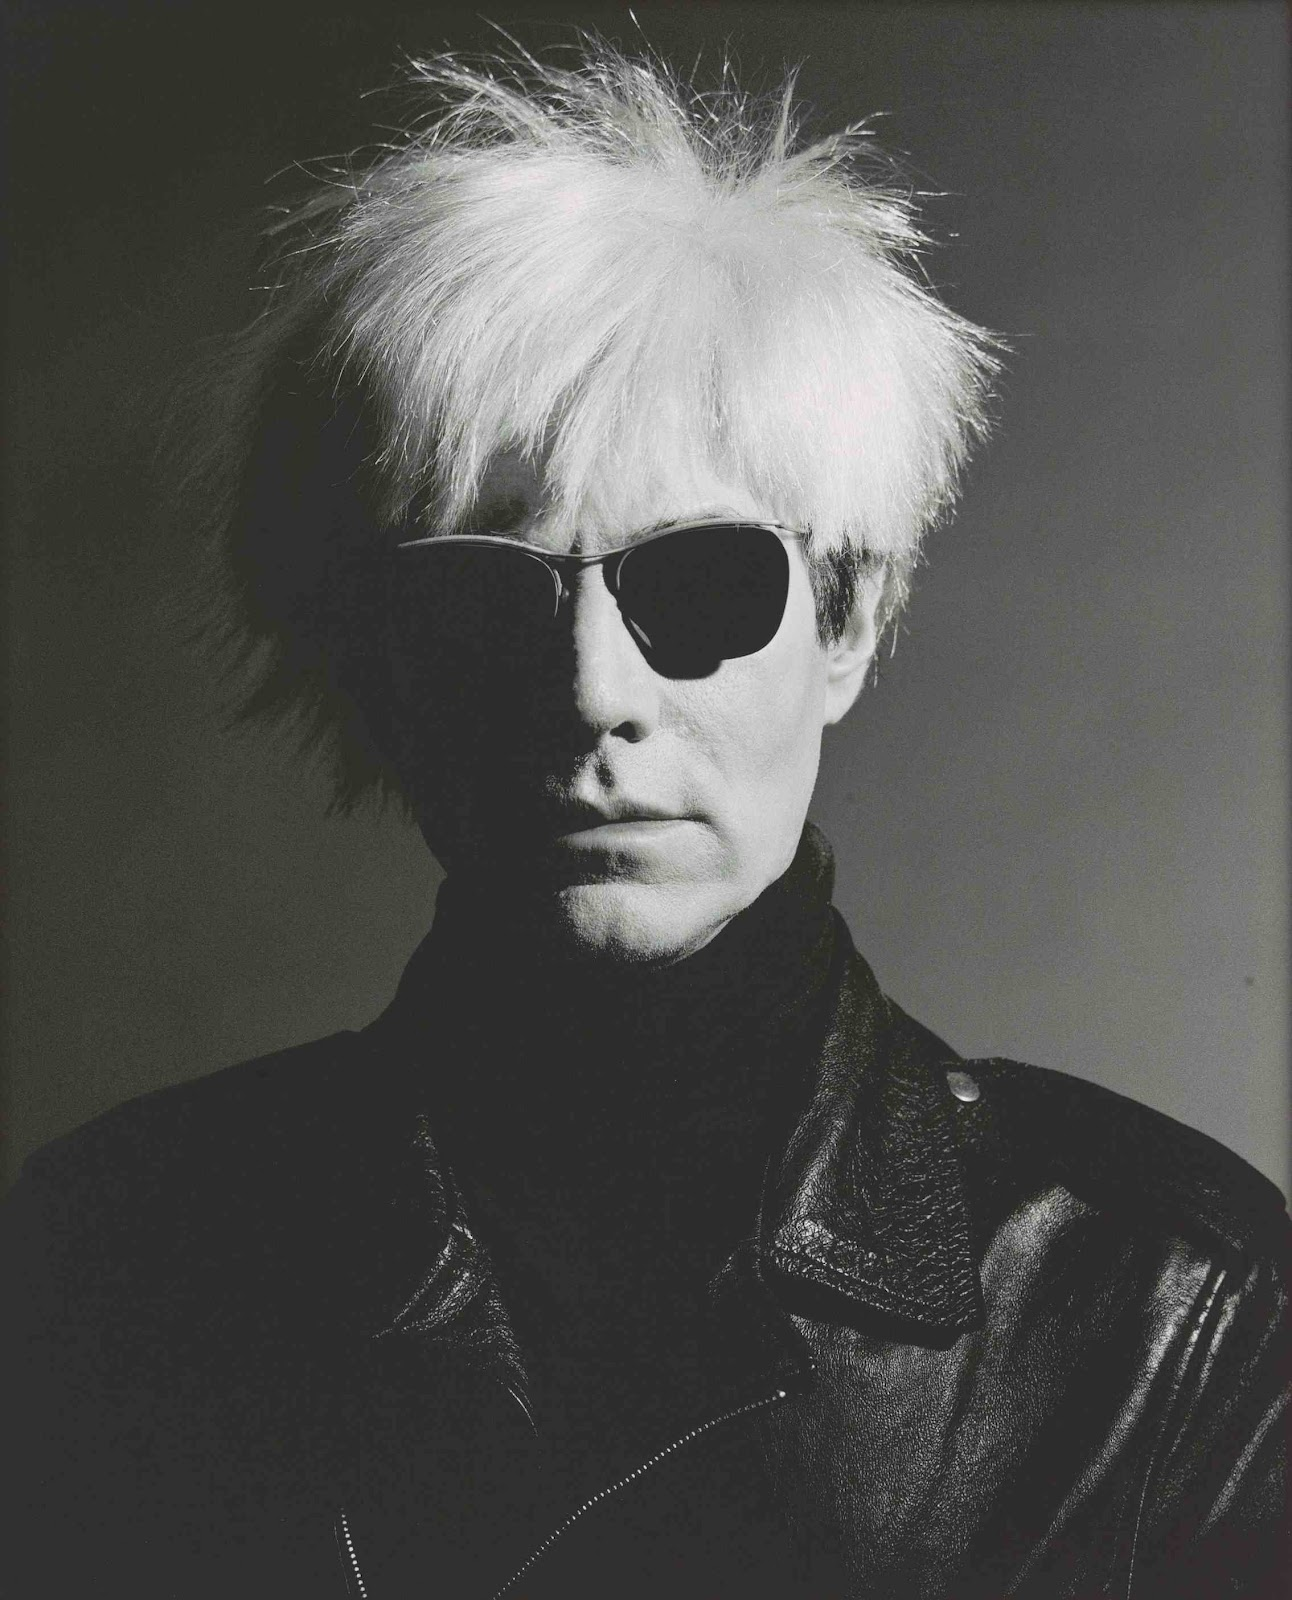 http://4.bp.blogspot.com/-T0xJHryFKmI/Tz7CRTmvbeI/AAAAAAAAf3w/s9iY2ovjwk4/s1600/Gorman-Andy-Warhol.jpg